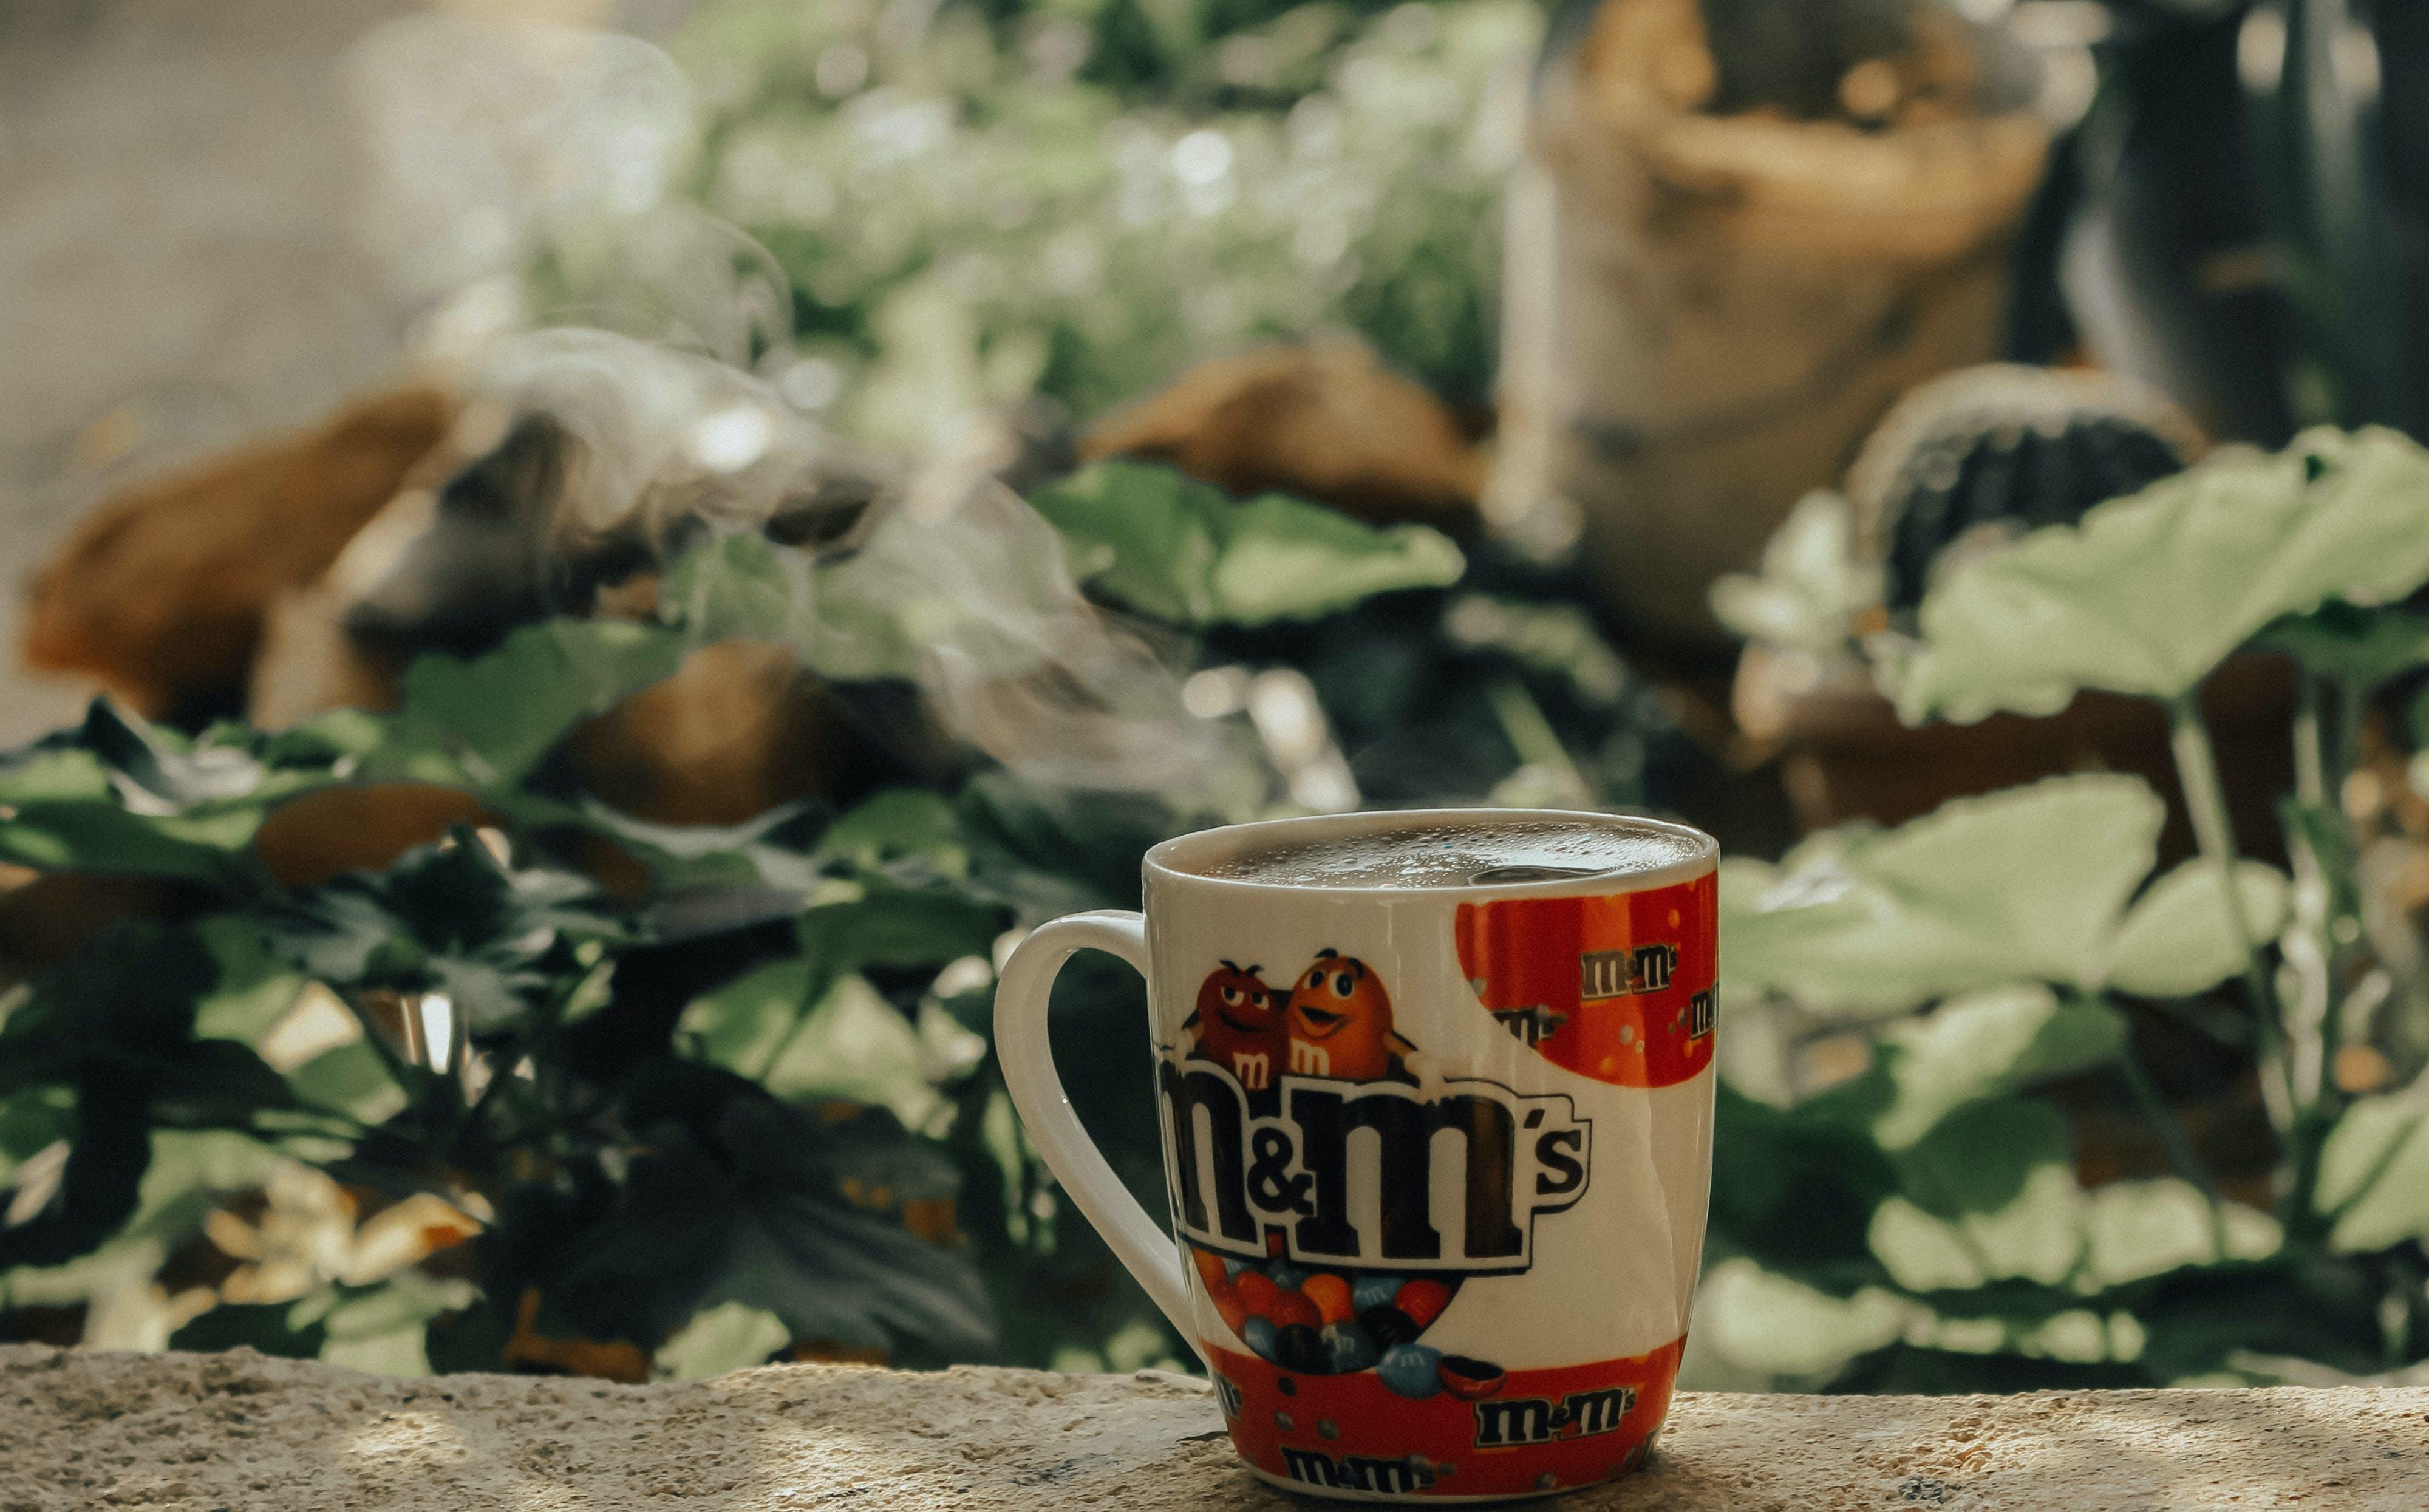 Selective Focus Photo of M&M's Ceramic Mug on Gray Concrete